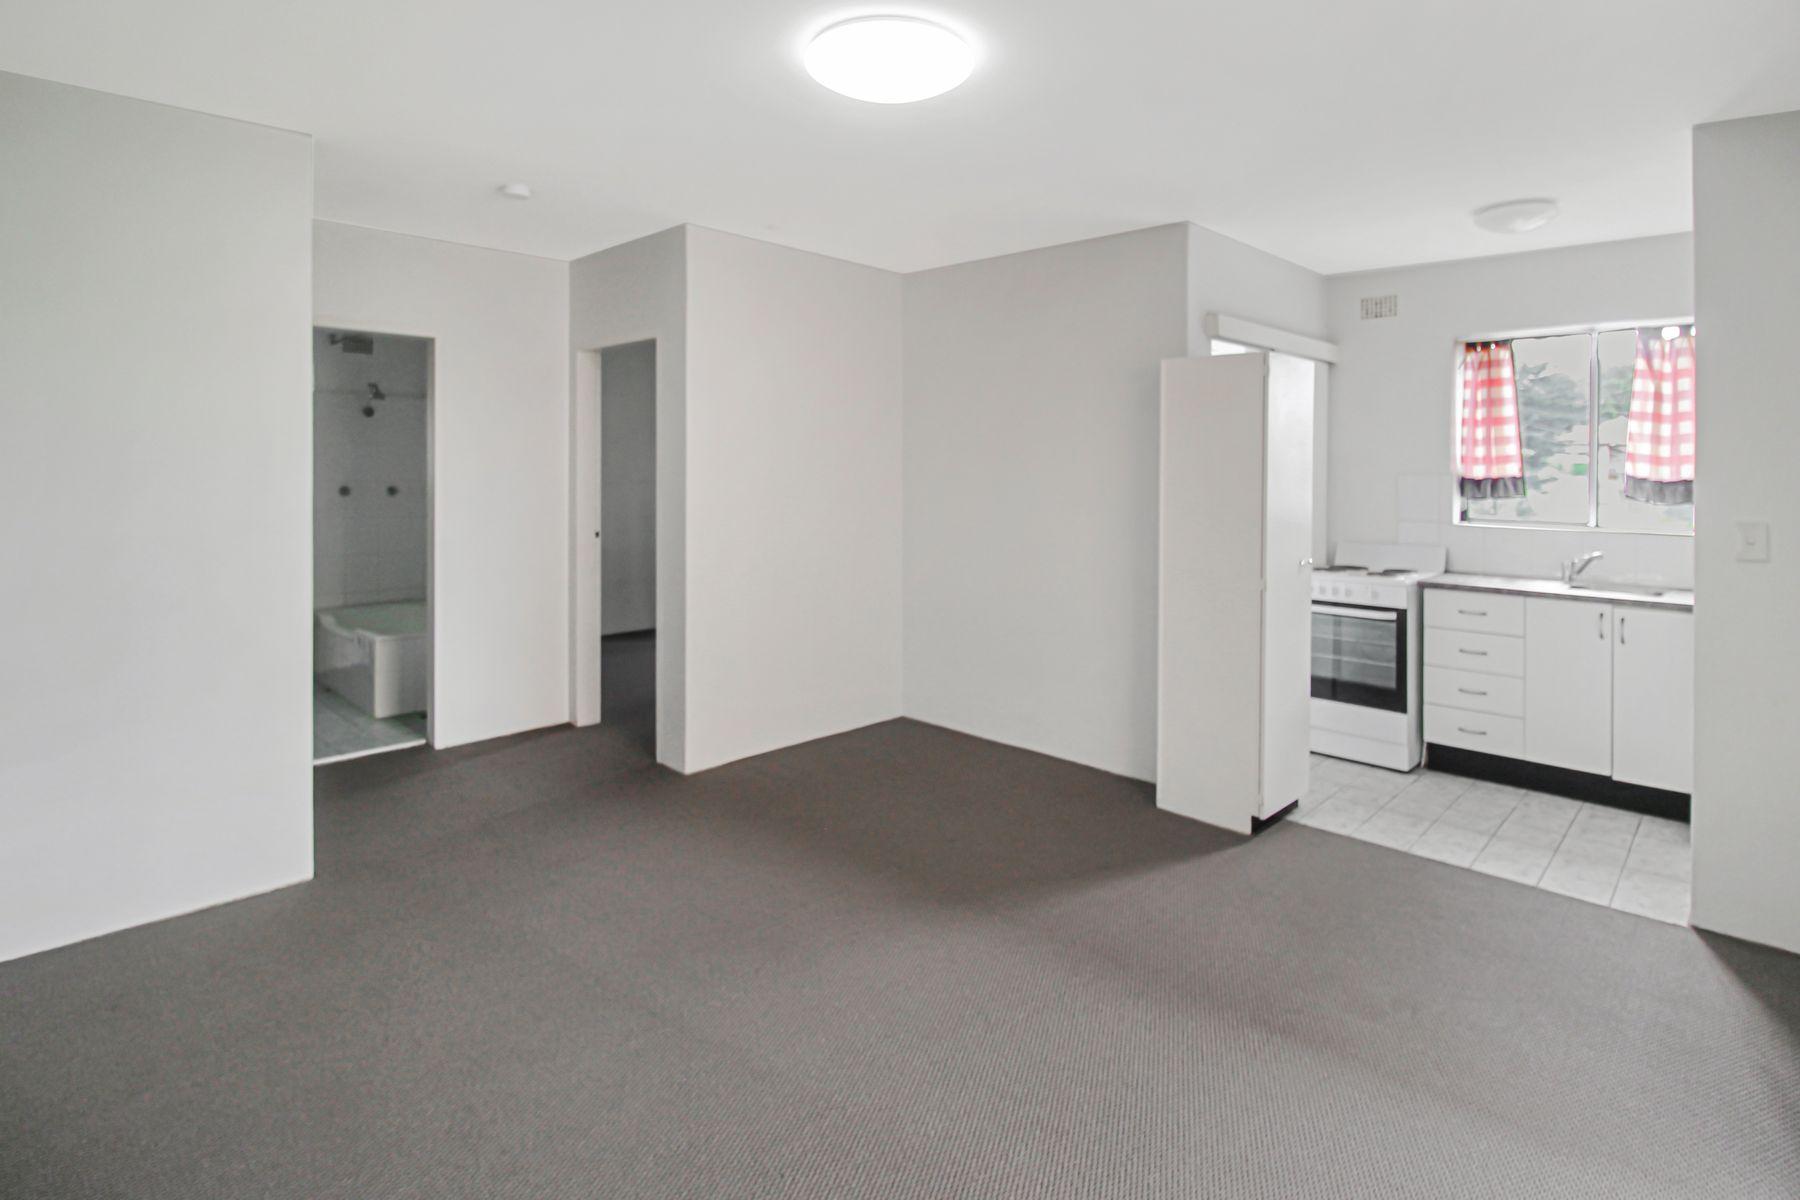 3/7 Cambridge Street, Gladesville, NSW 2111